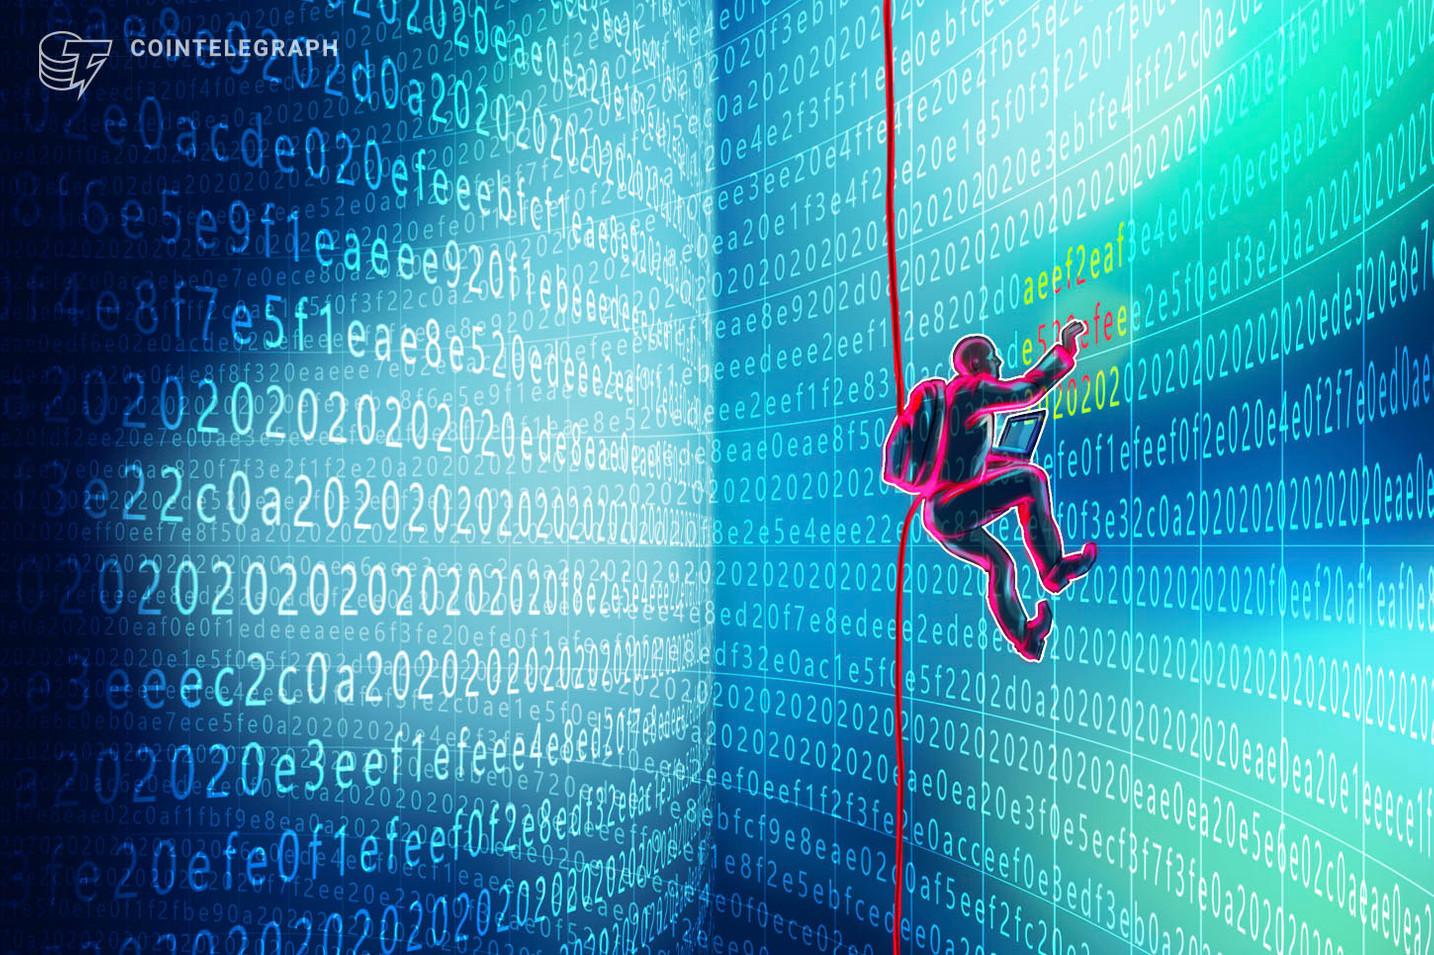 HackerOne User Reveals Critical Bug Through MakerDAO Bounty Program